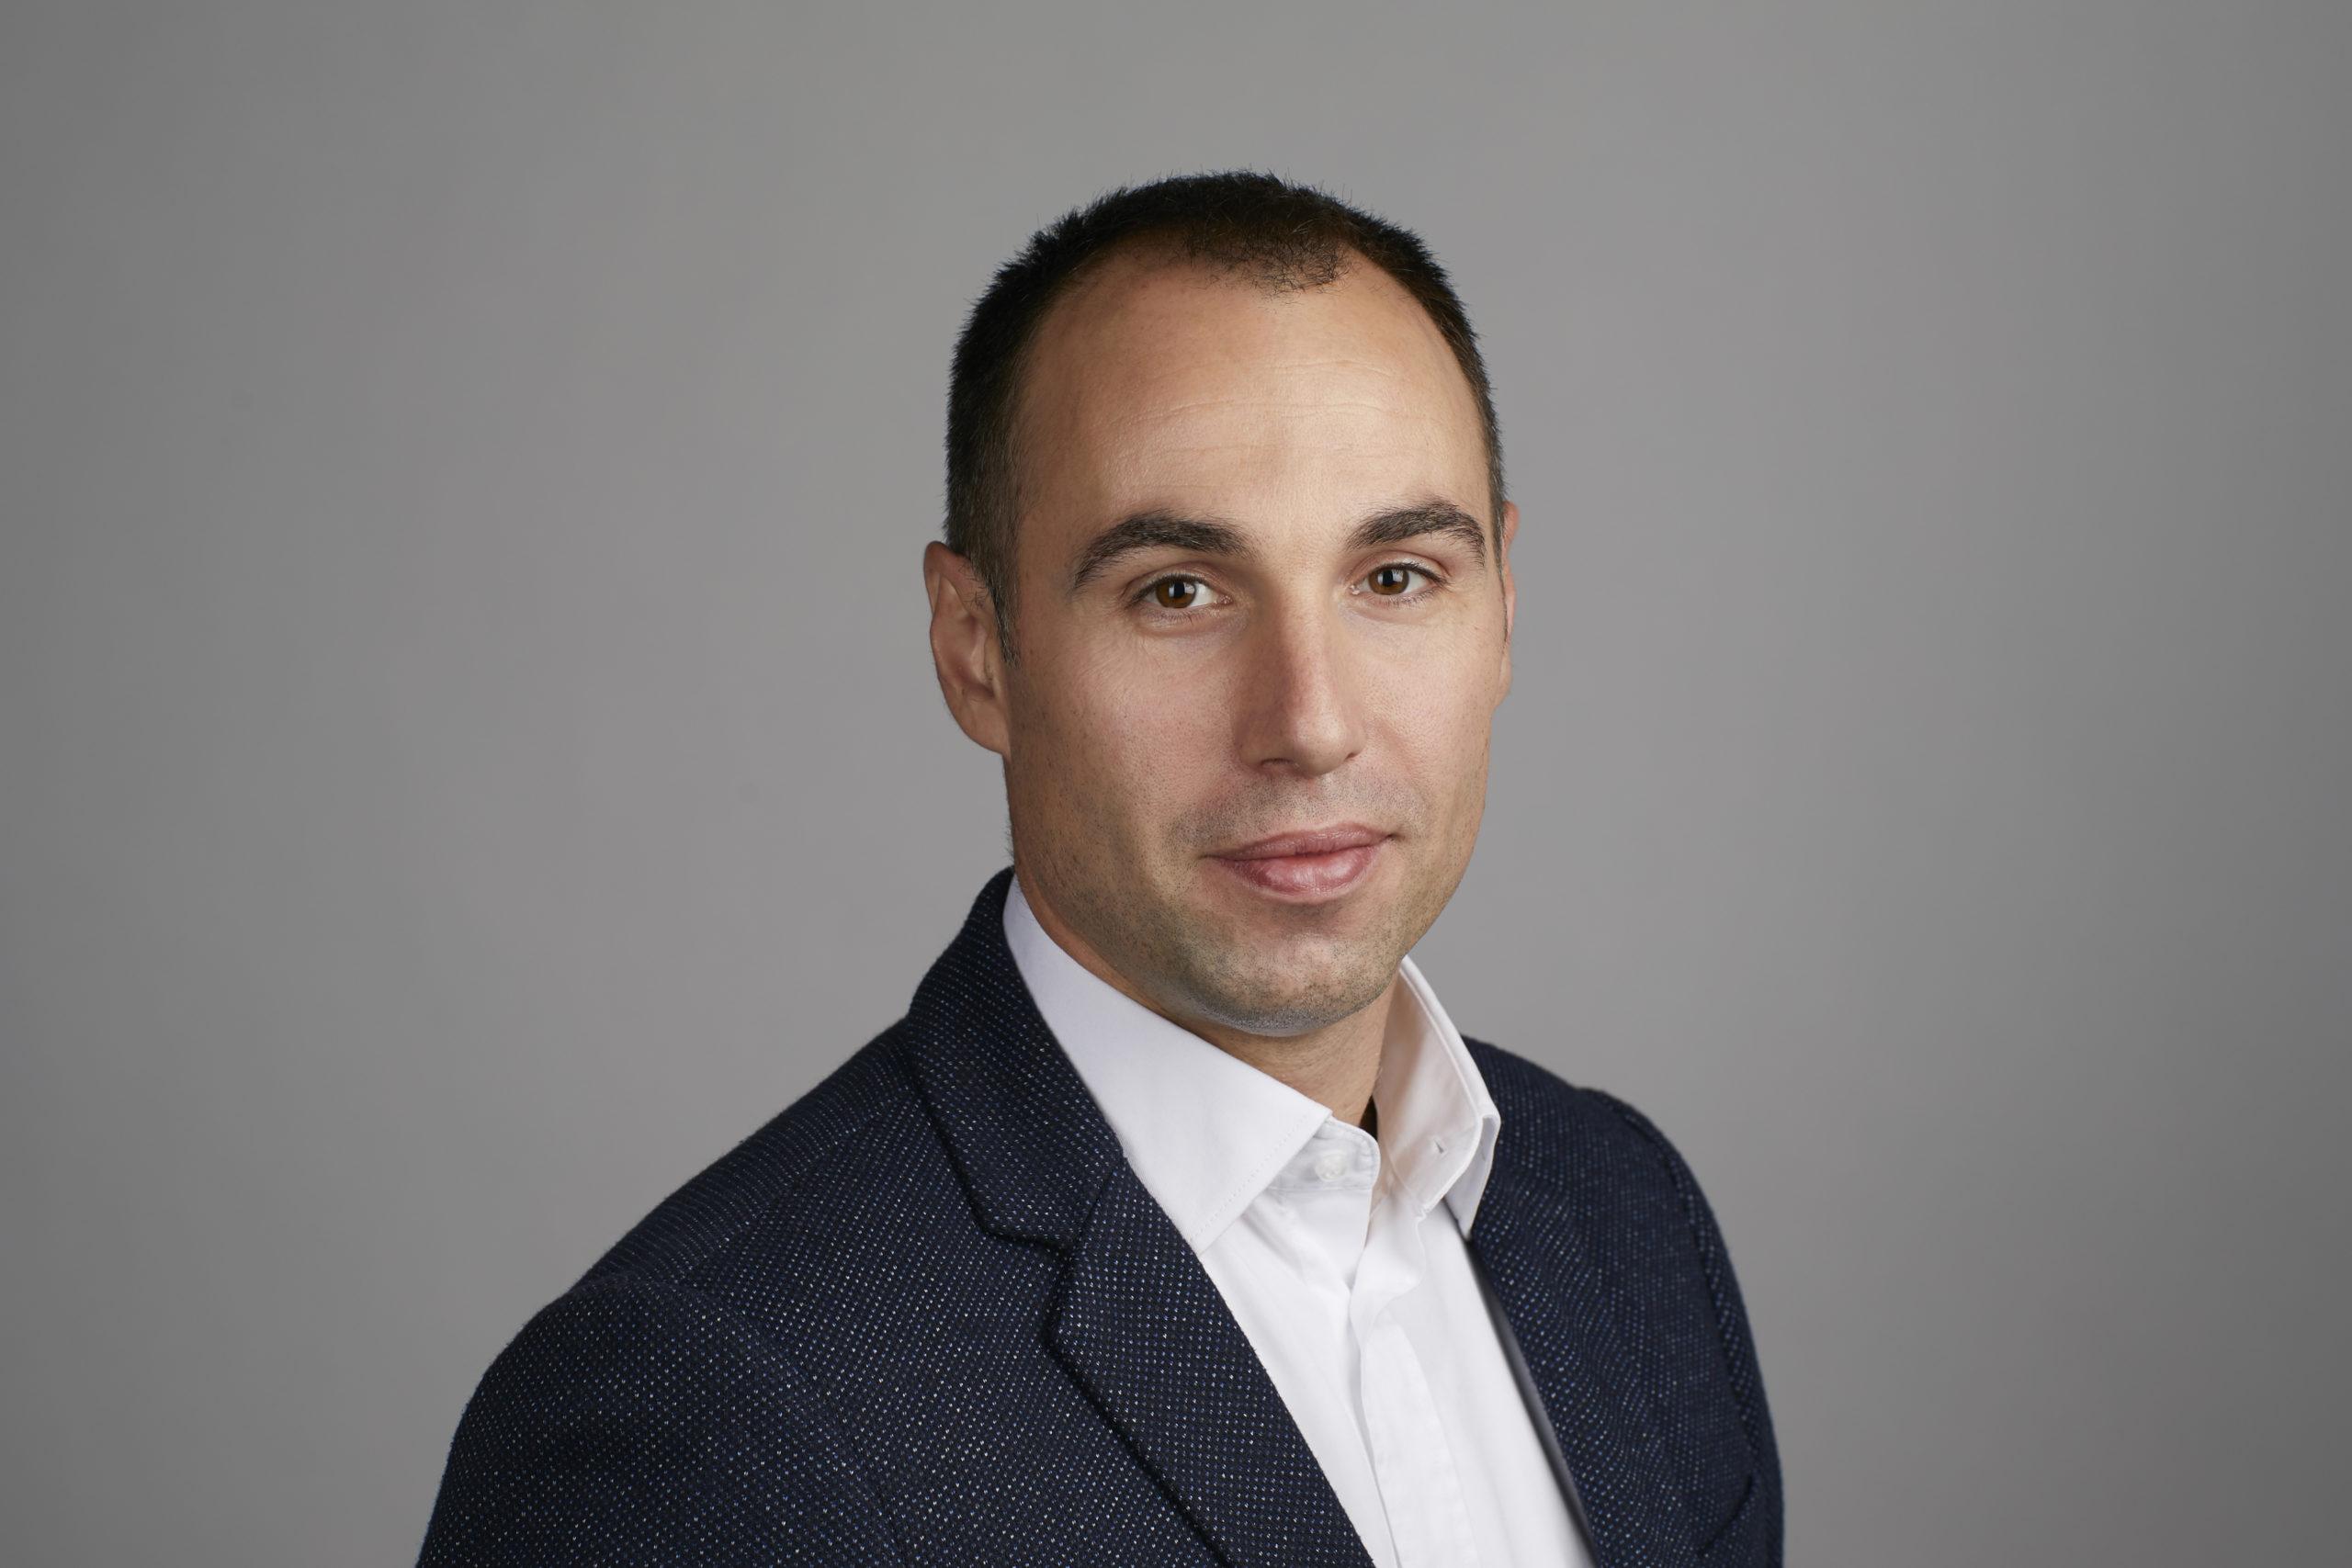 Vladimir Pavlovic WM Equity Partners